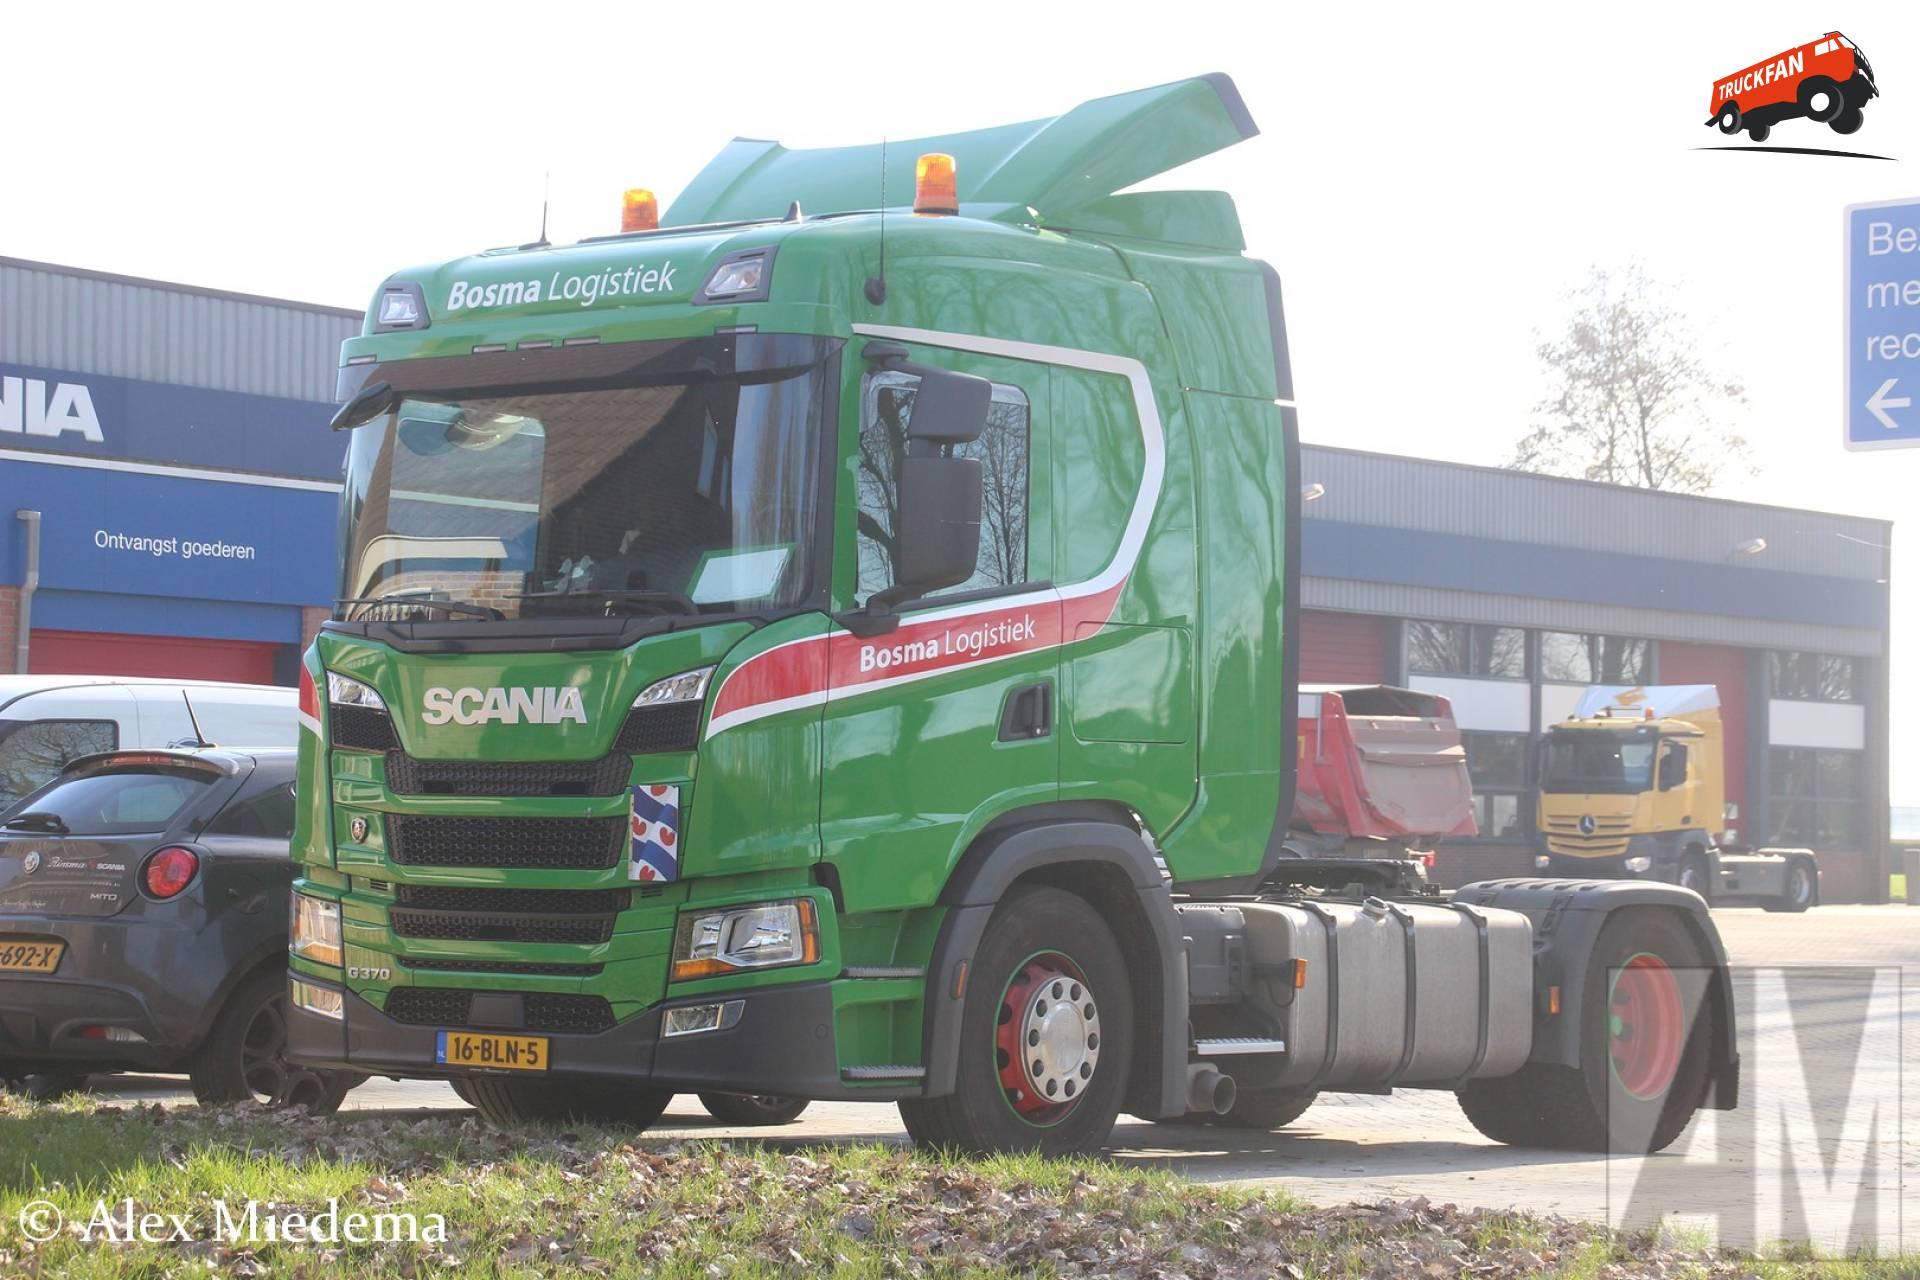 Scania G370